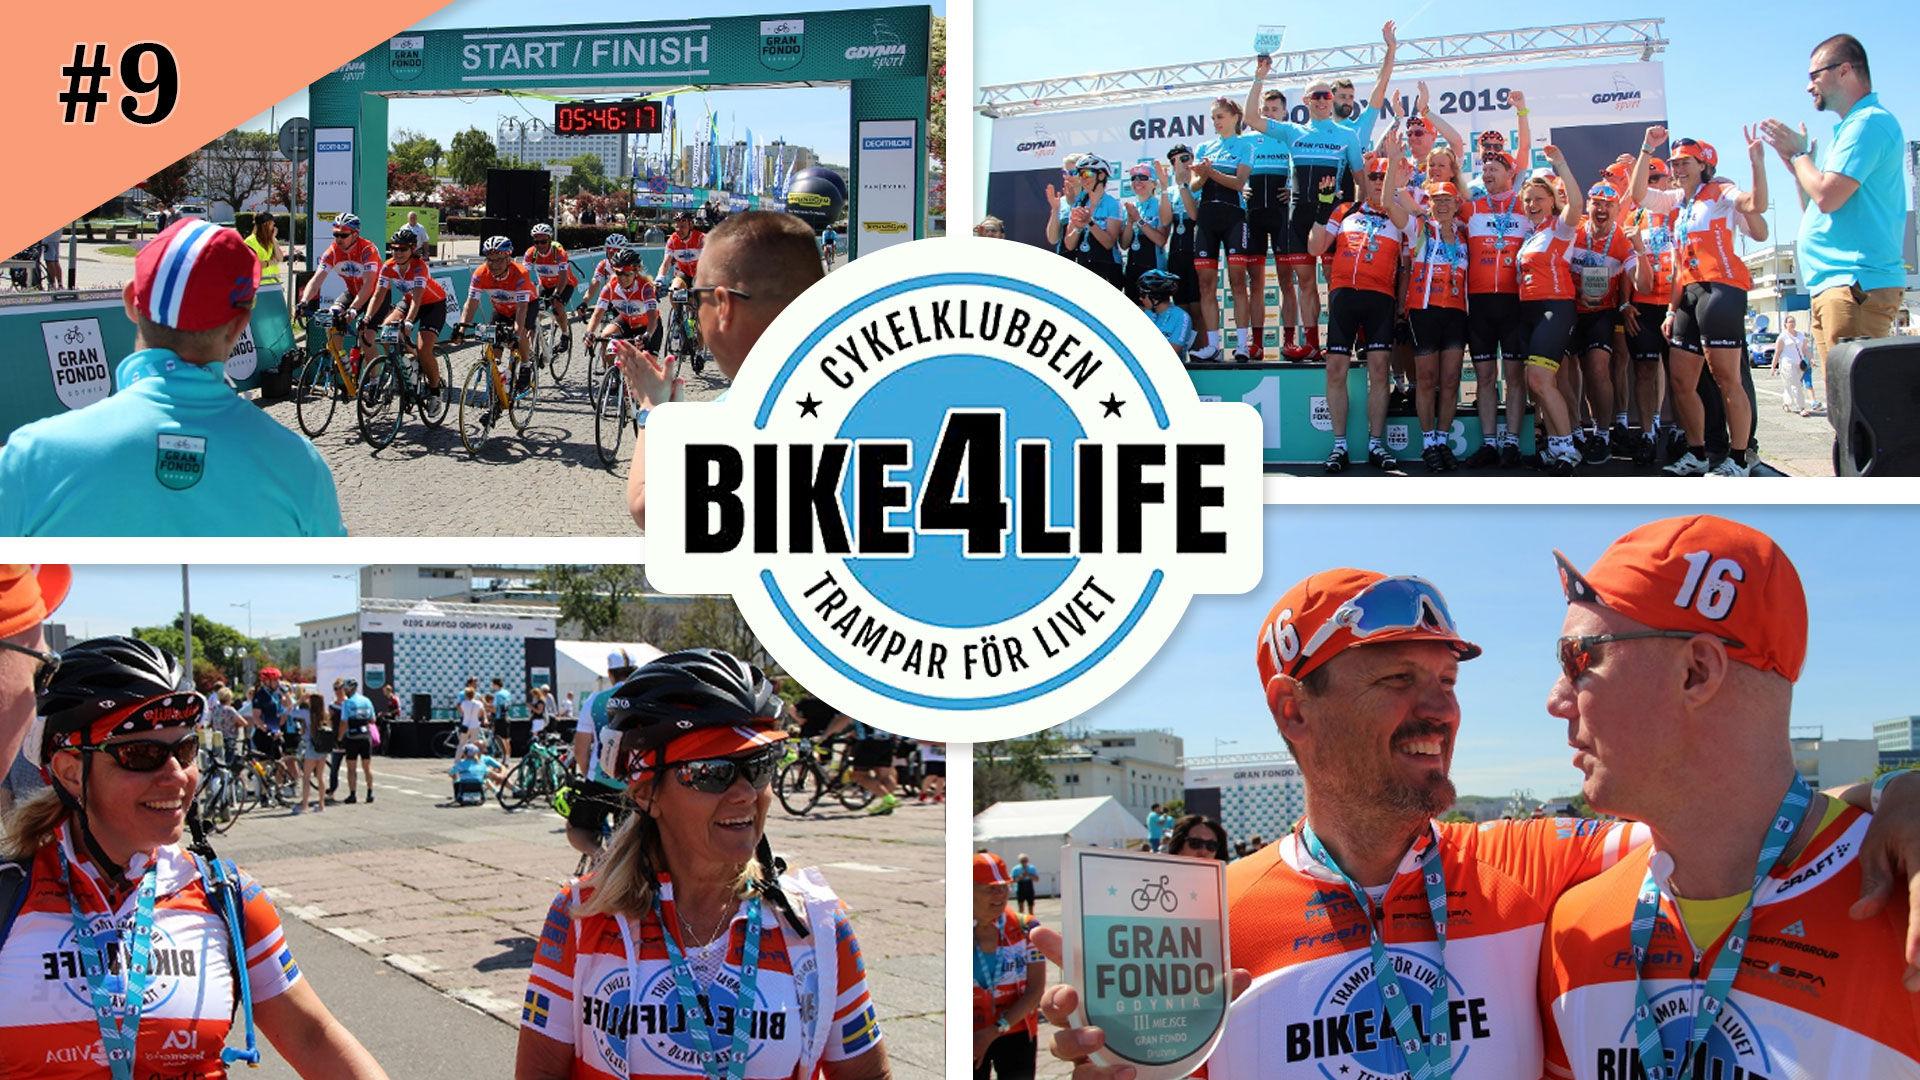 Bike4Life etapp 9